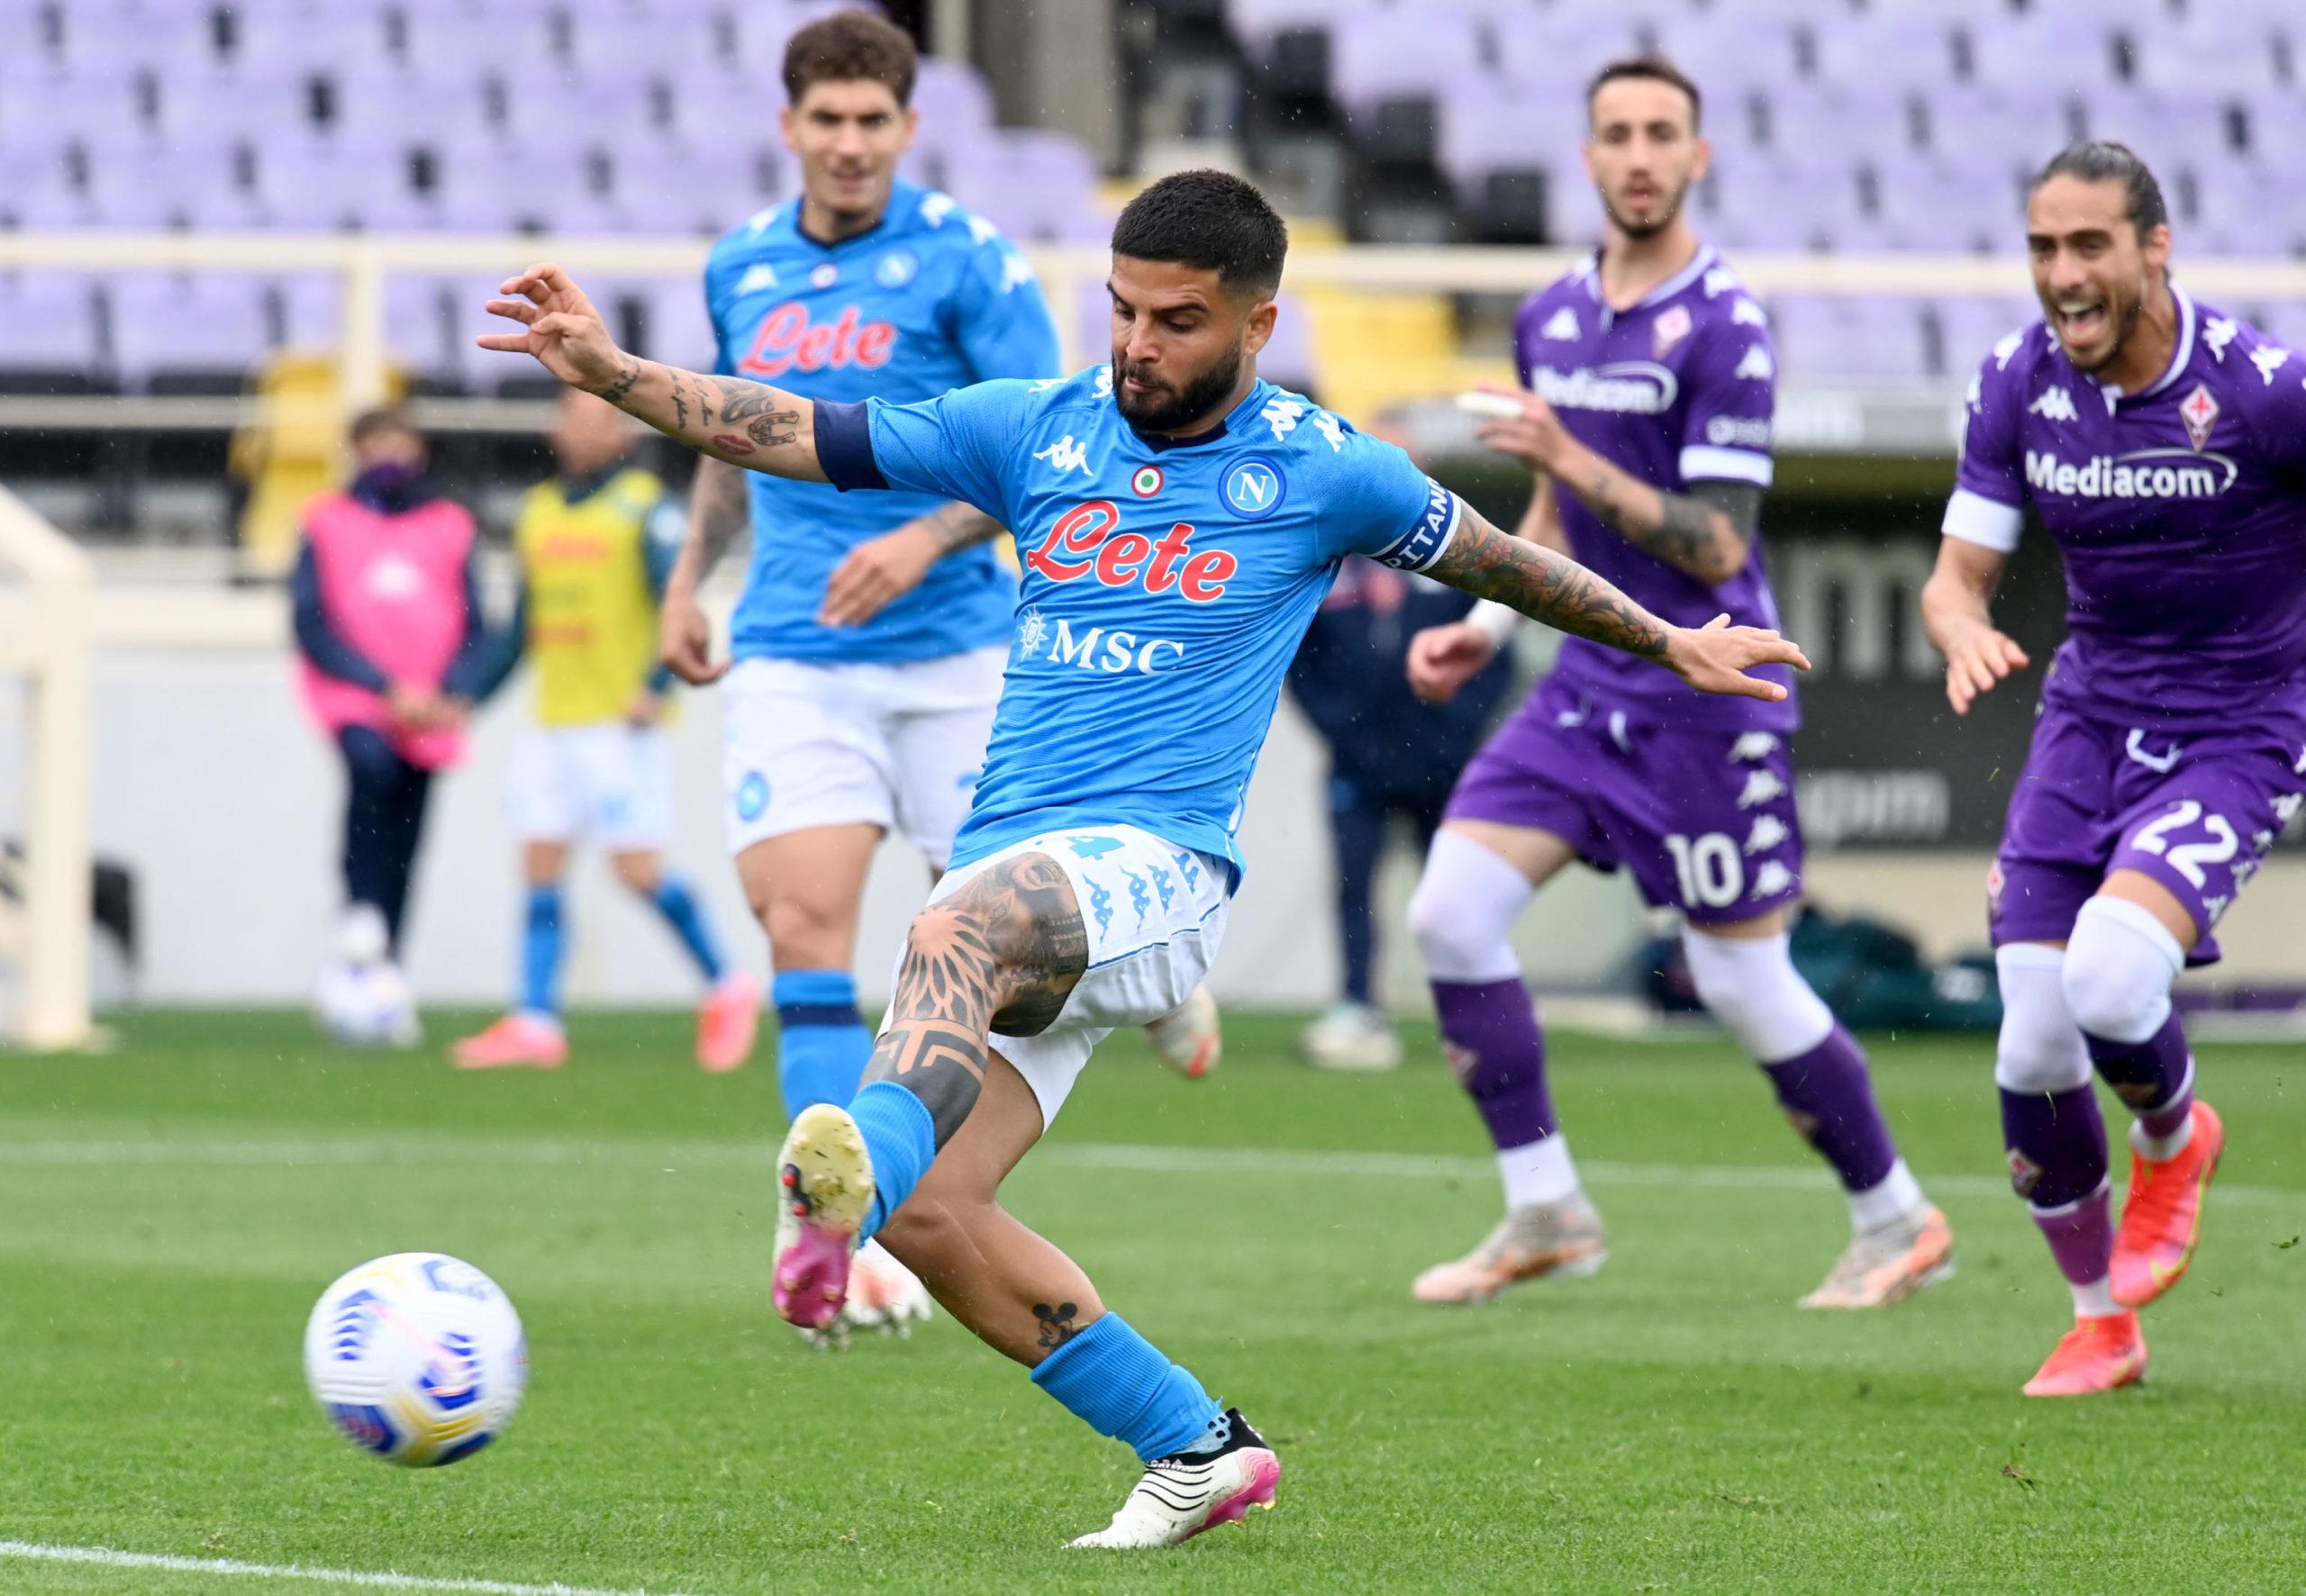 Lorenzo Insigne scores for Napoli against Fiorentina